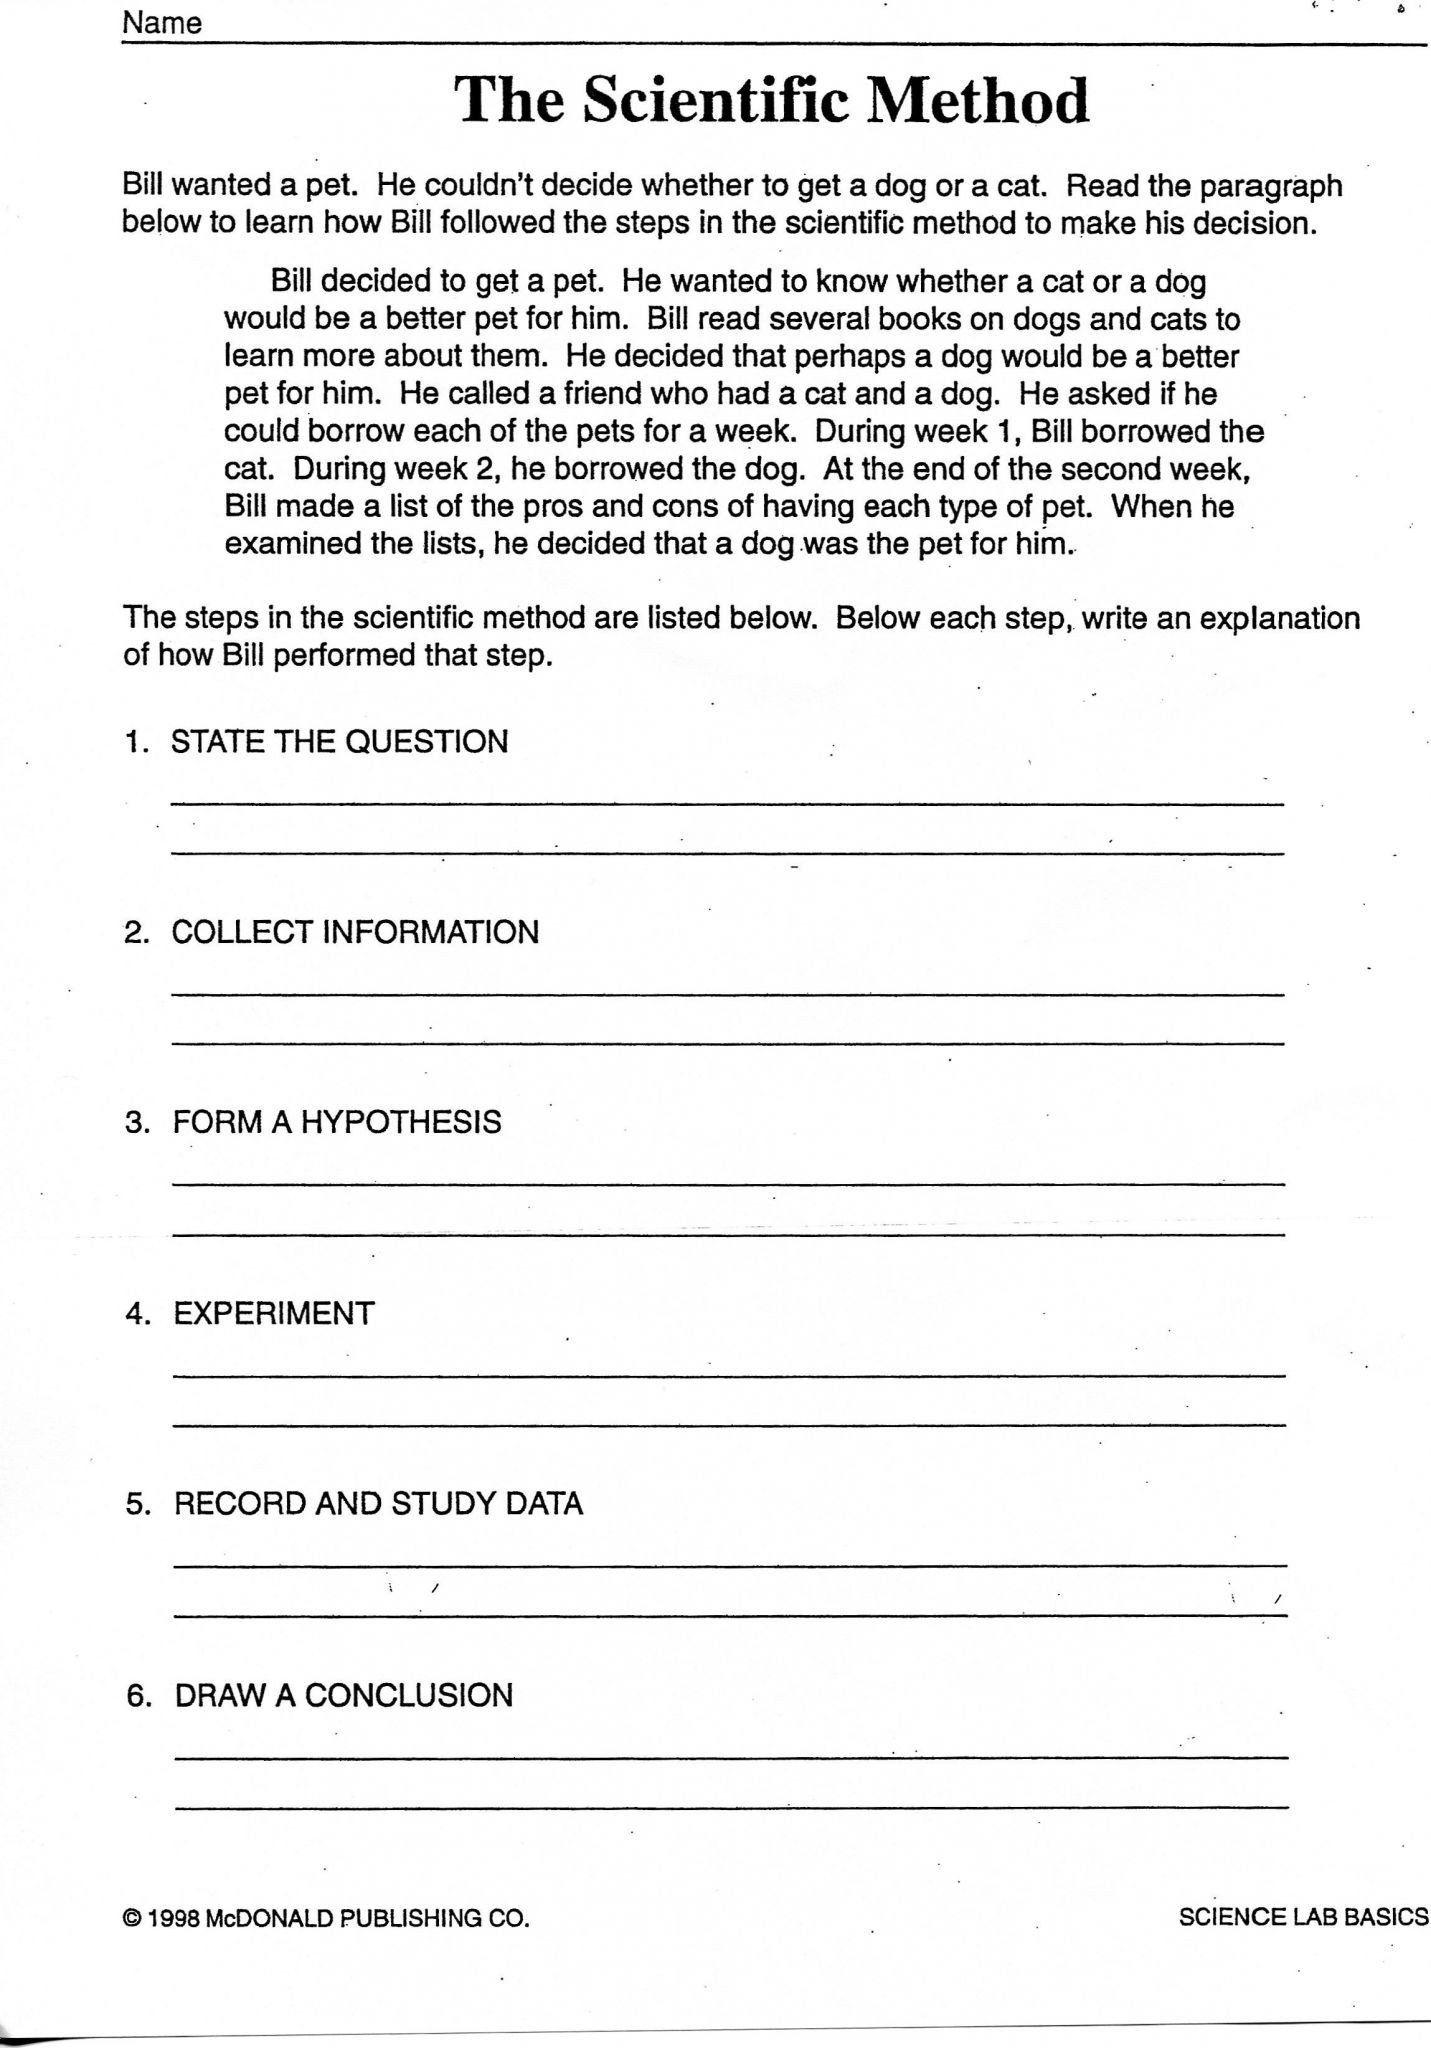 Scientific Method 3rd Grade Worksheet Free 3rd Grade